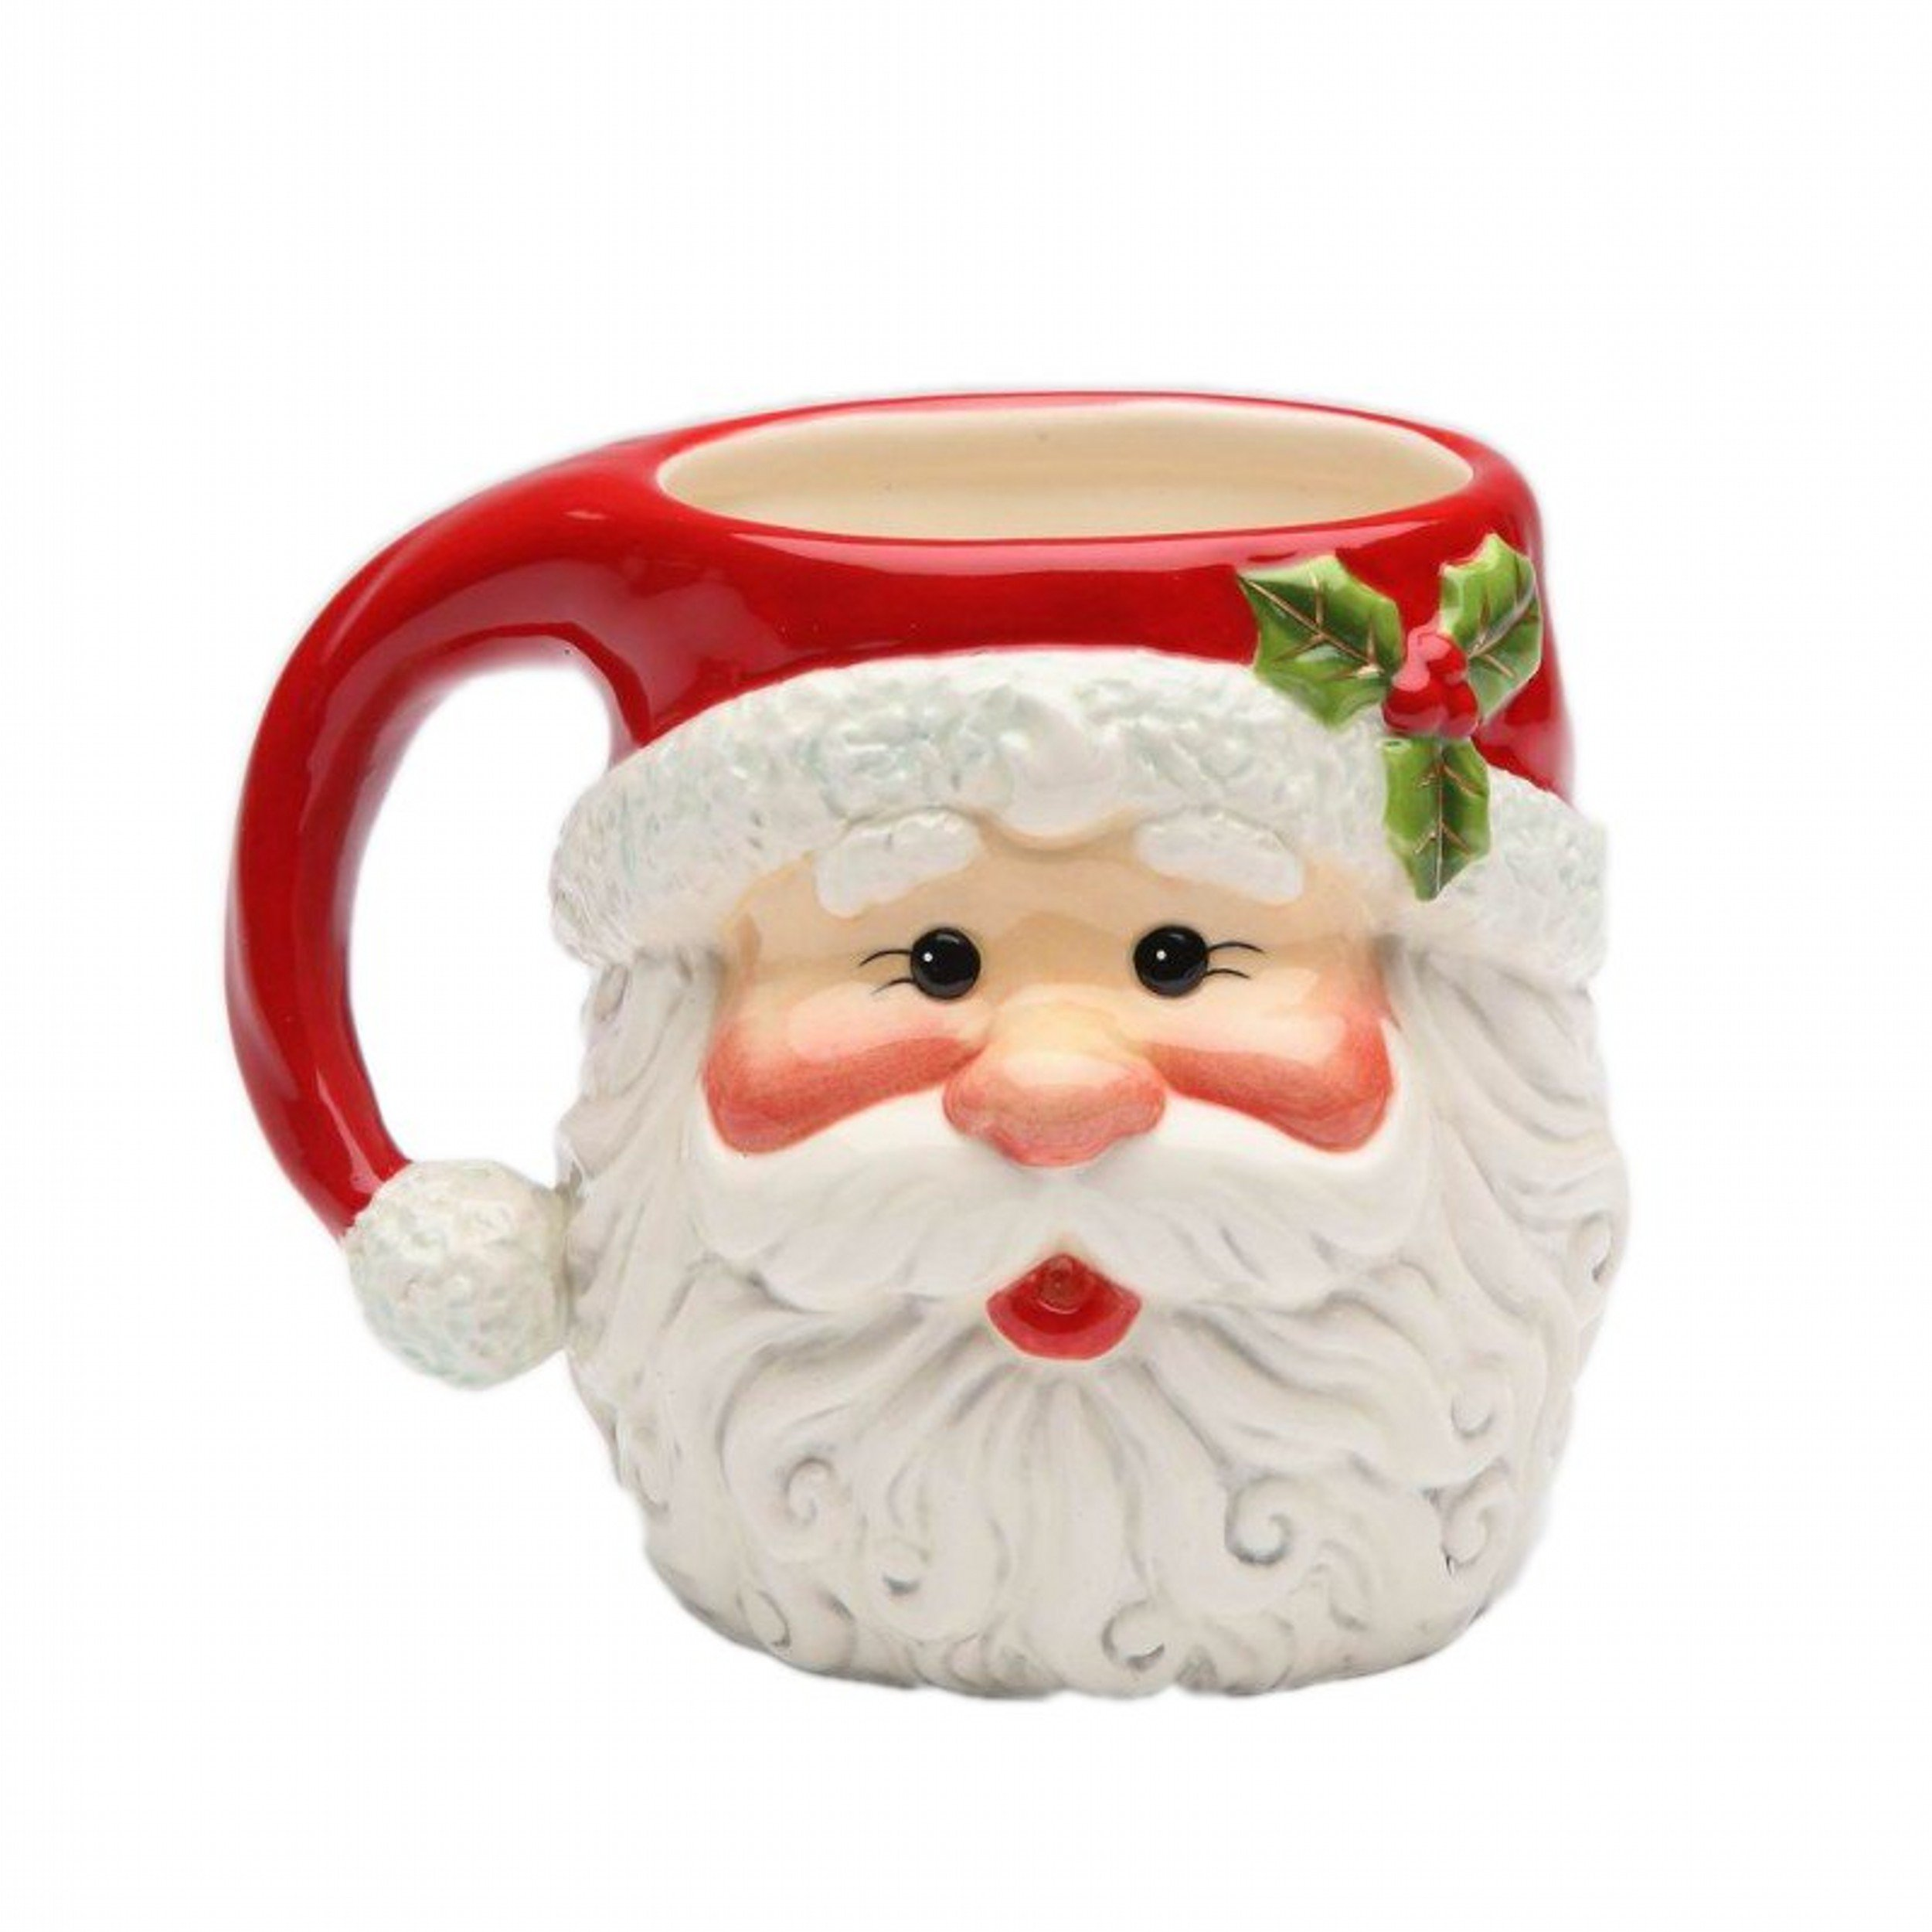 Image of Cute I Believe Christmas Santa Claus Mugs - Set of 4